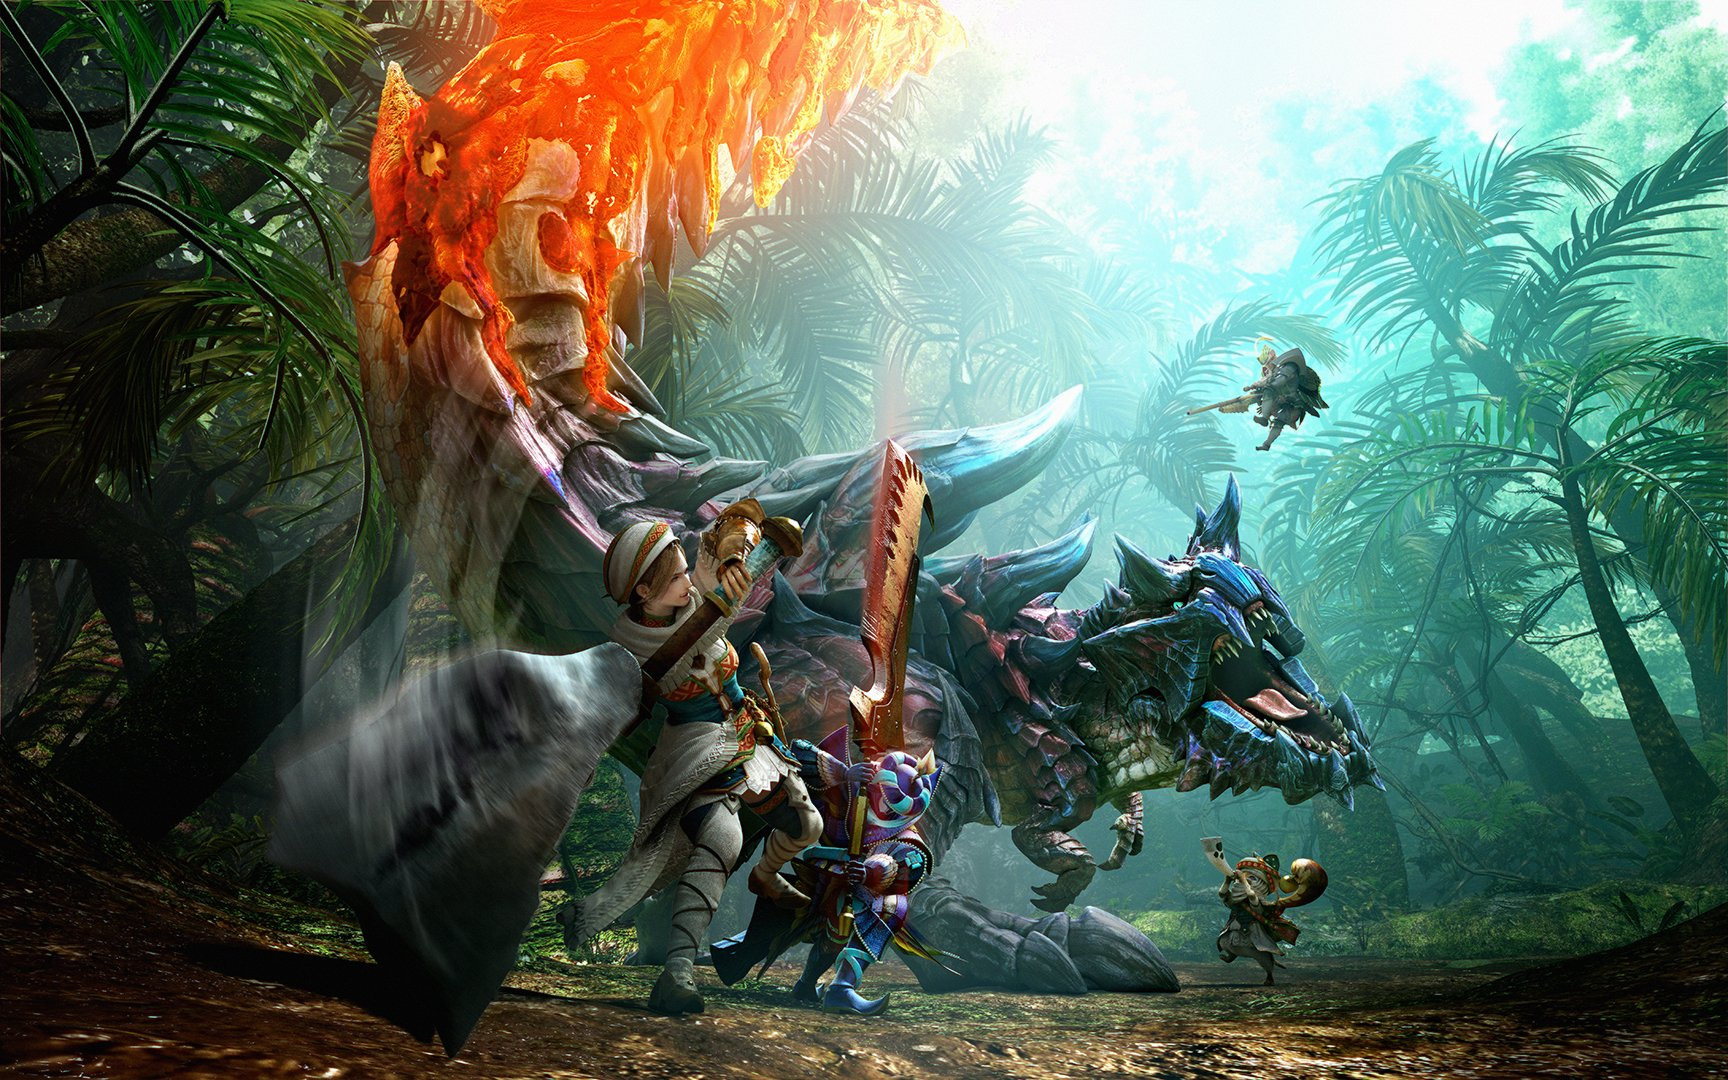 Amazon com: Monster Hunter Generations - Nintendo 3DS